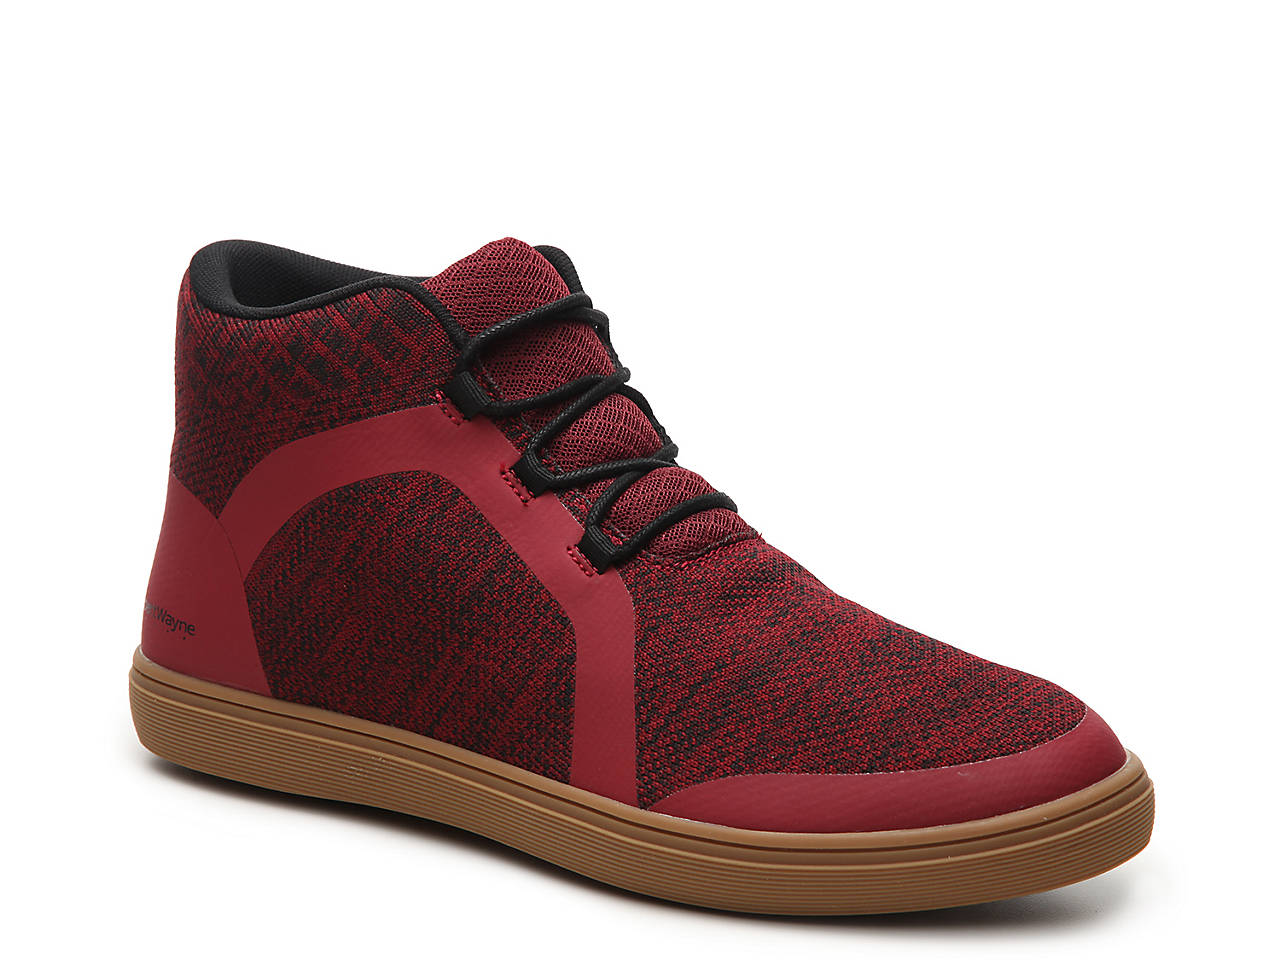 Robert Wayne Fenmore Hi-Top Sneaker Limited Edition Online Big Sale Cheap Price 9K7guuT